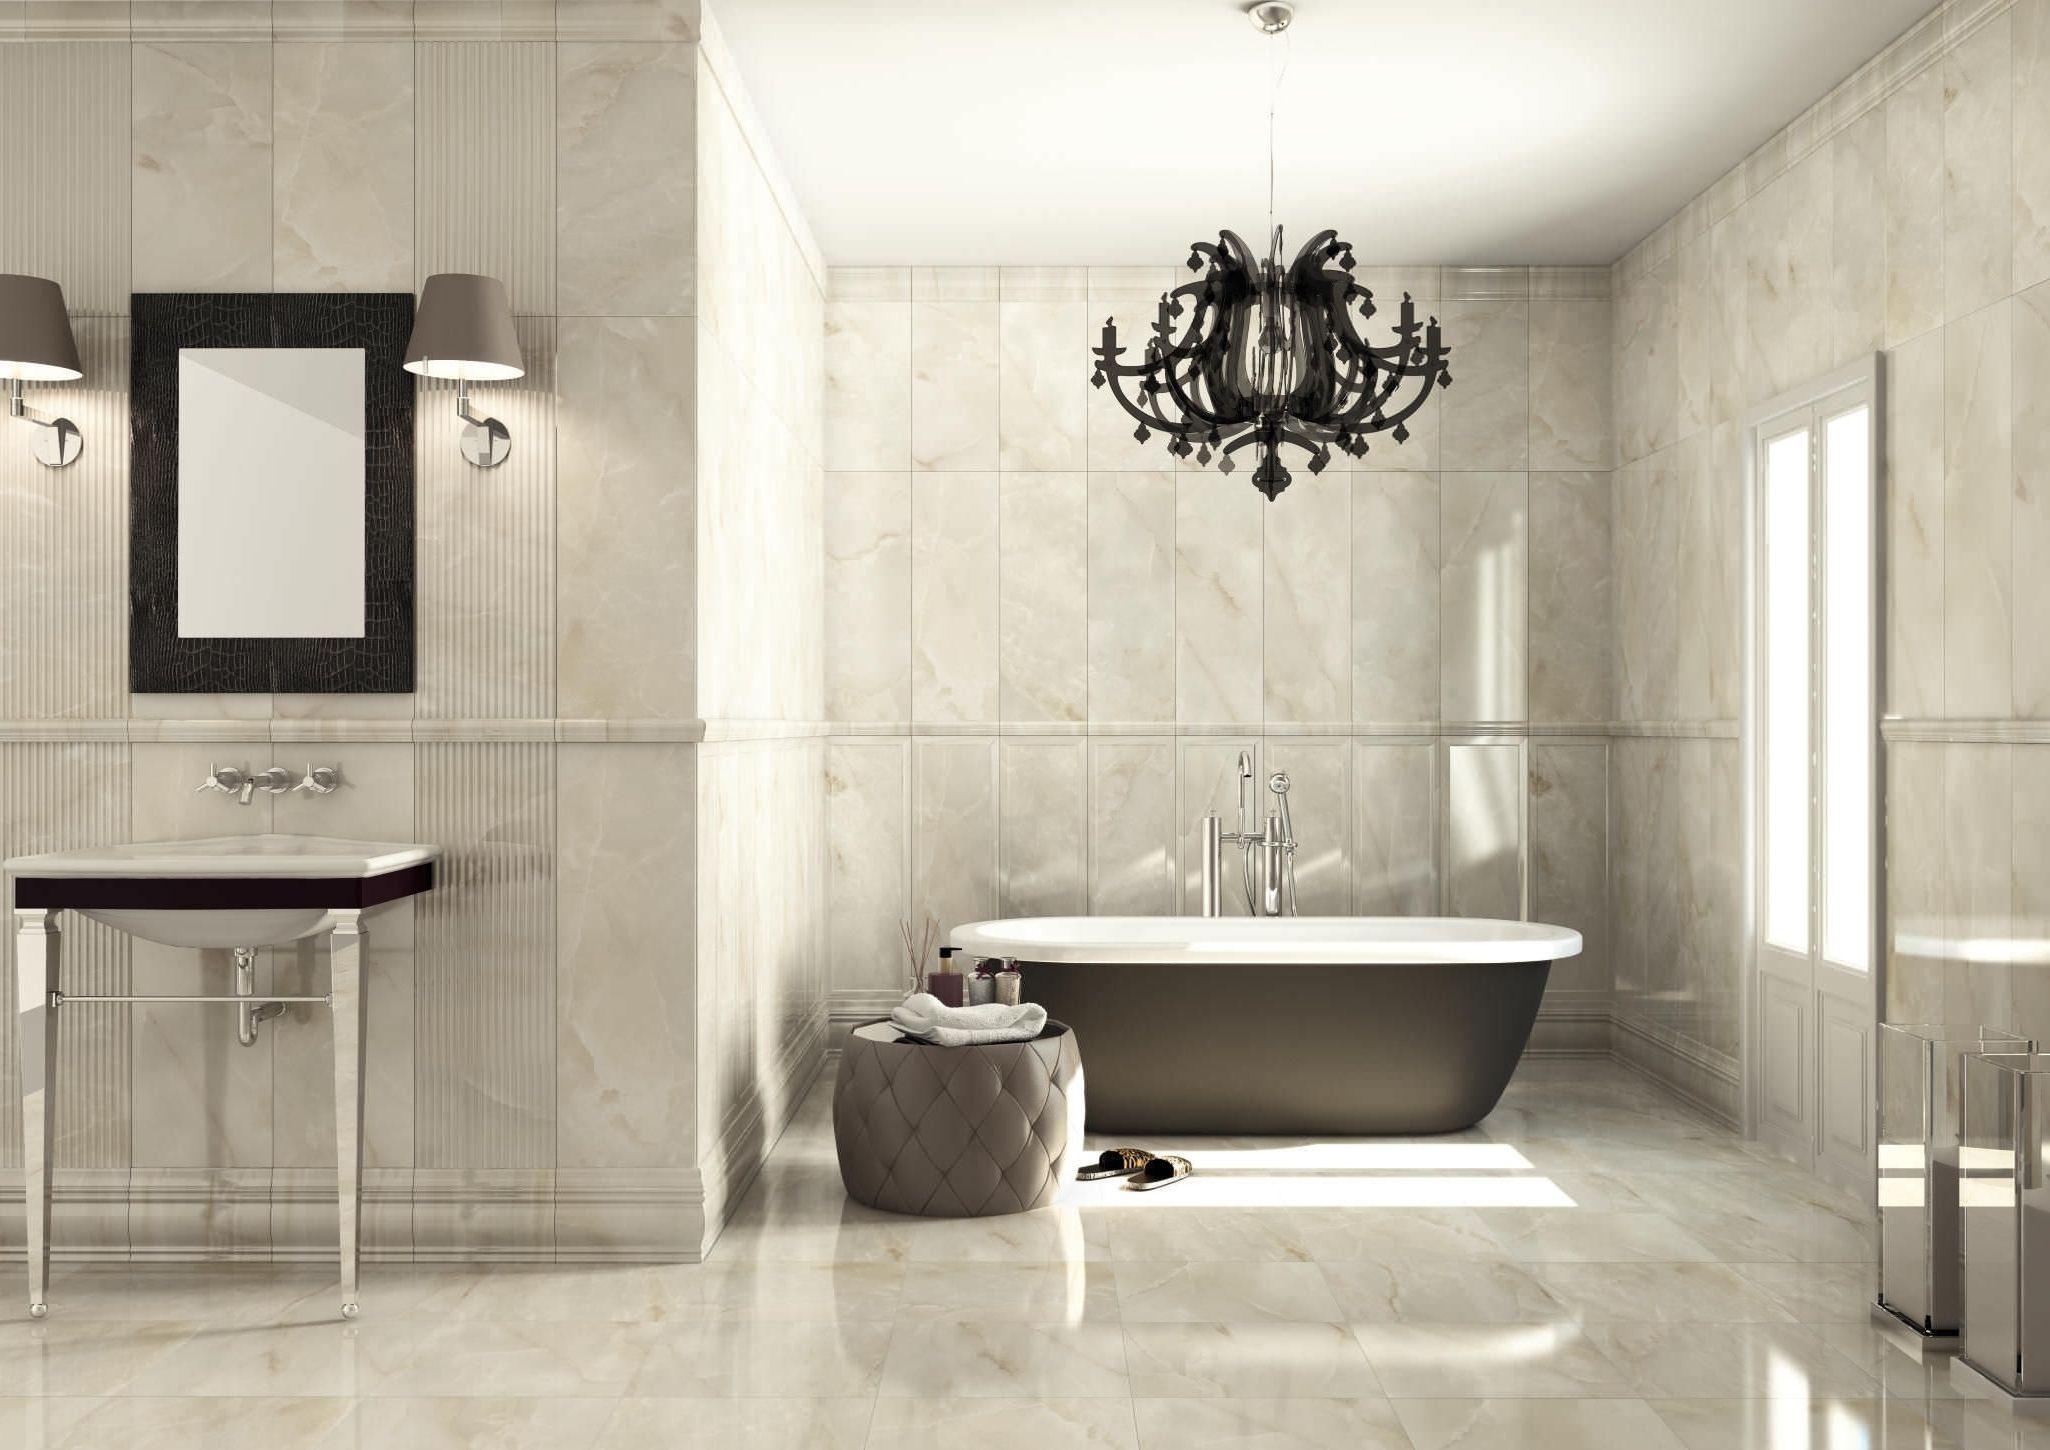 Fantastisch 15 Besten Ideen Badezimmer Kronleuchter